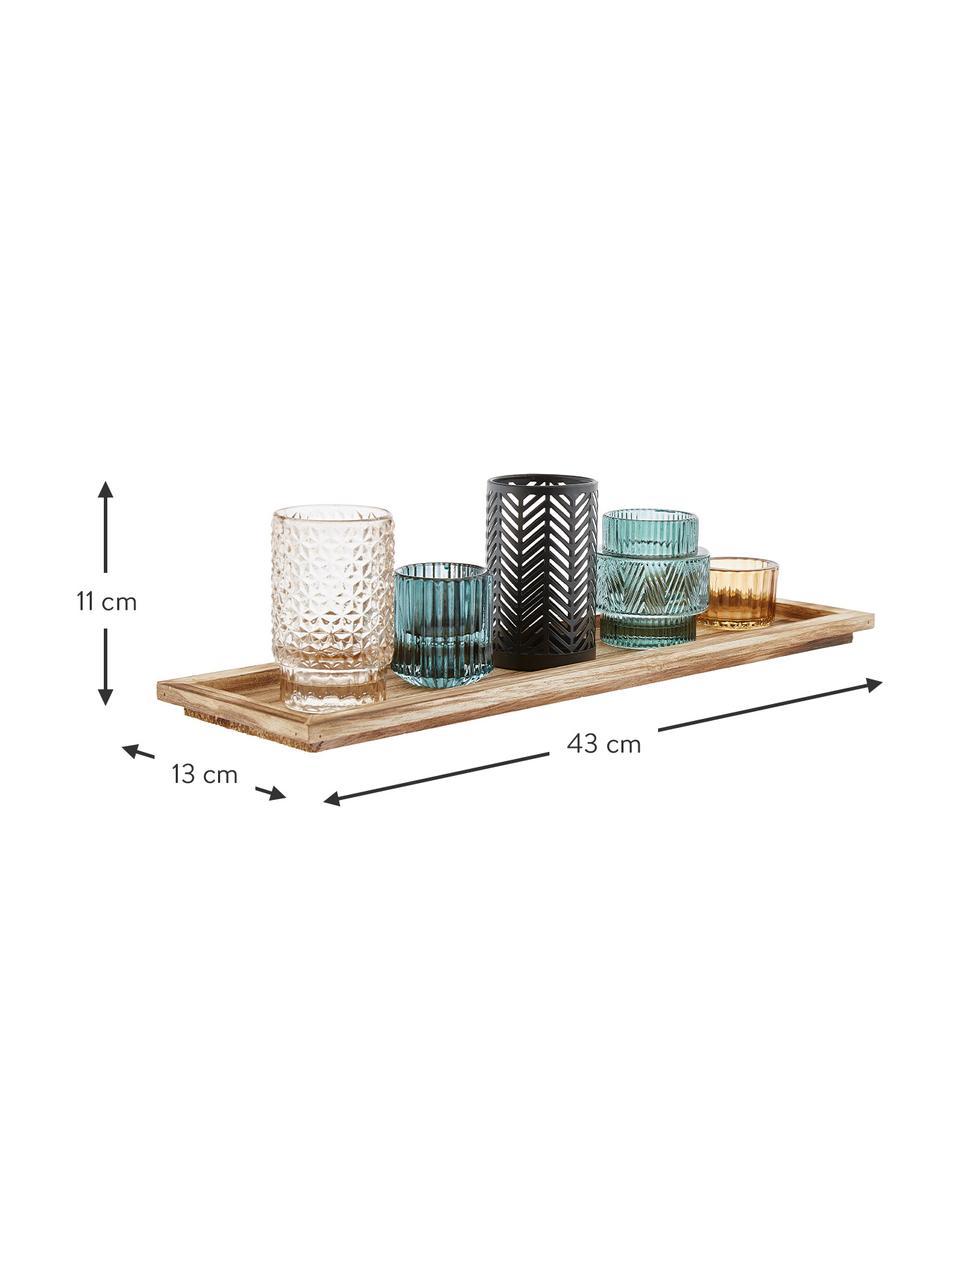 Set portacandele Homa 6 pz, Lanterne: vetro tinto a spruzzo, Vassoio: legno di paulownia, Multicolore, Larg. 43 x Alt. 11 cm